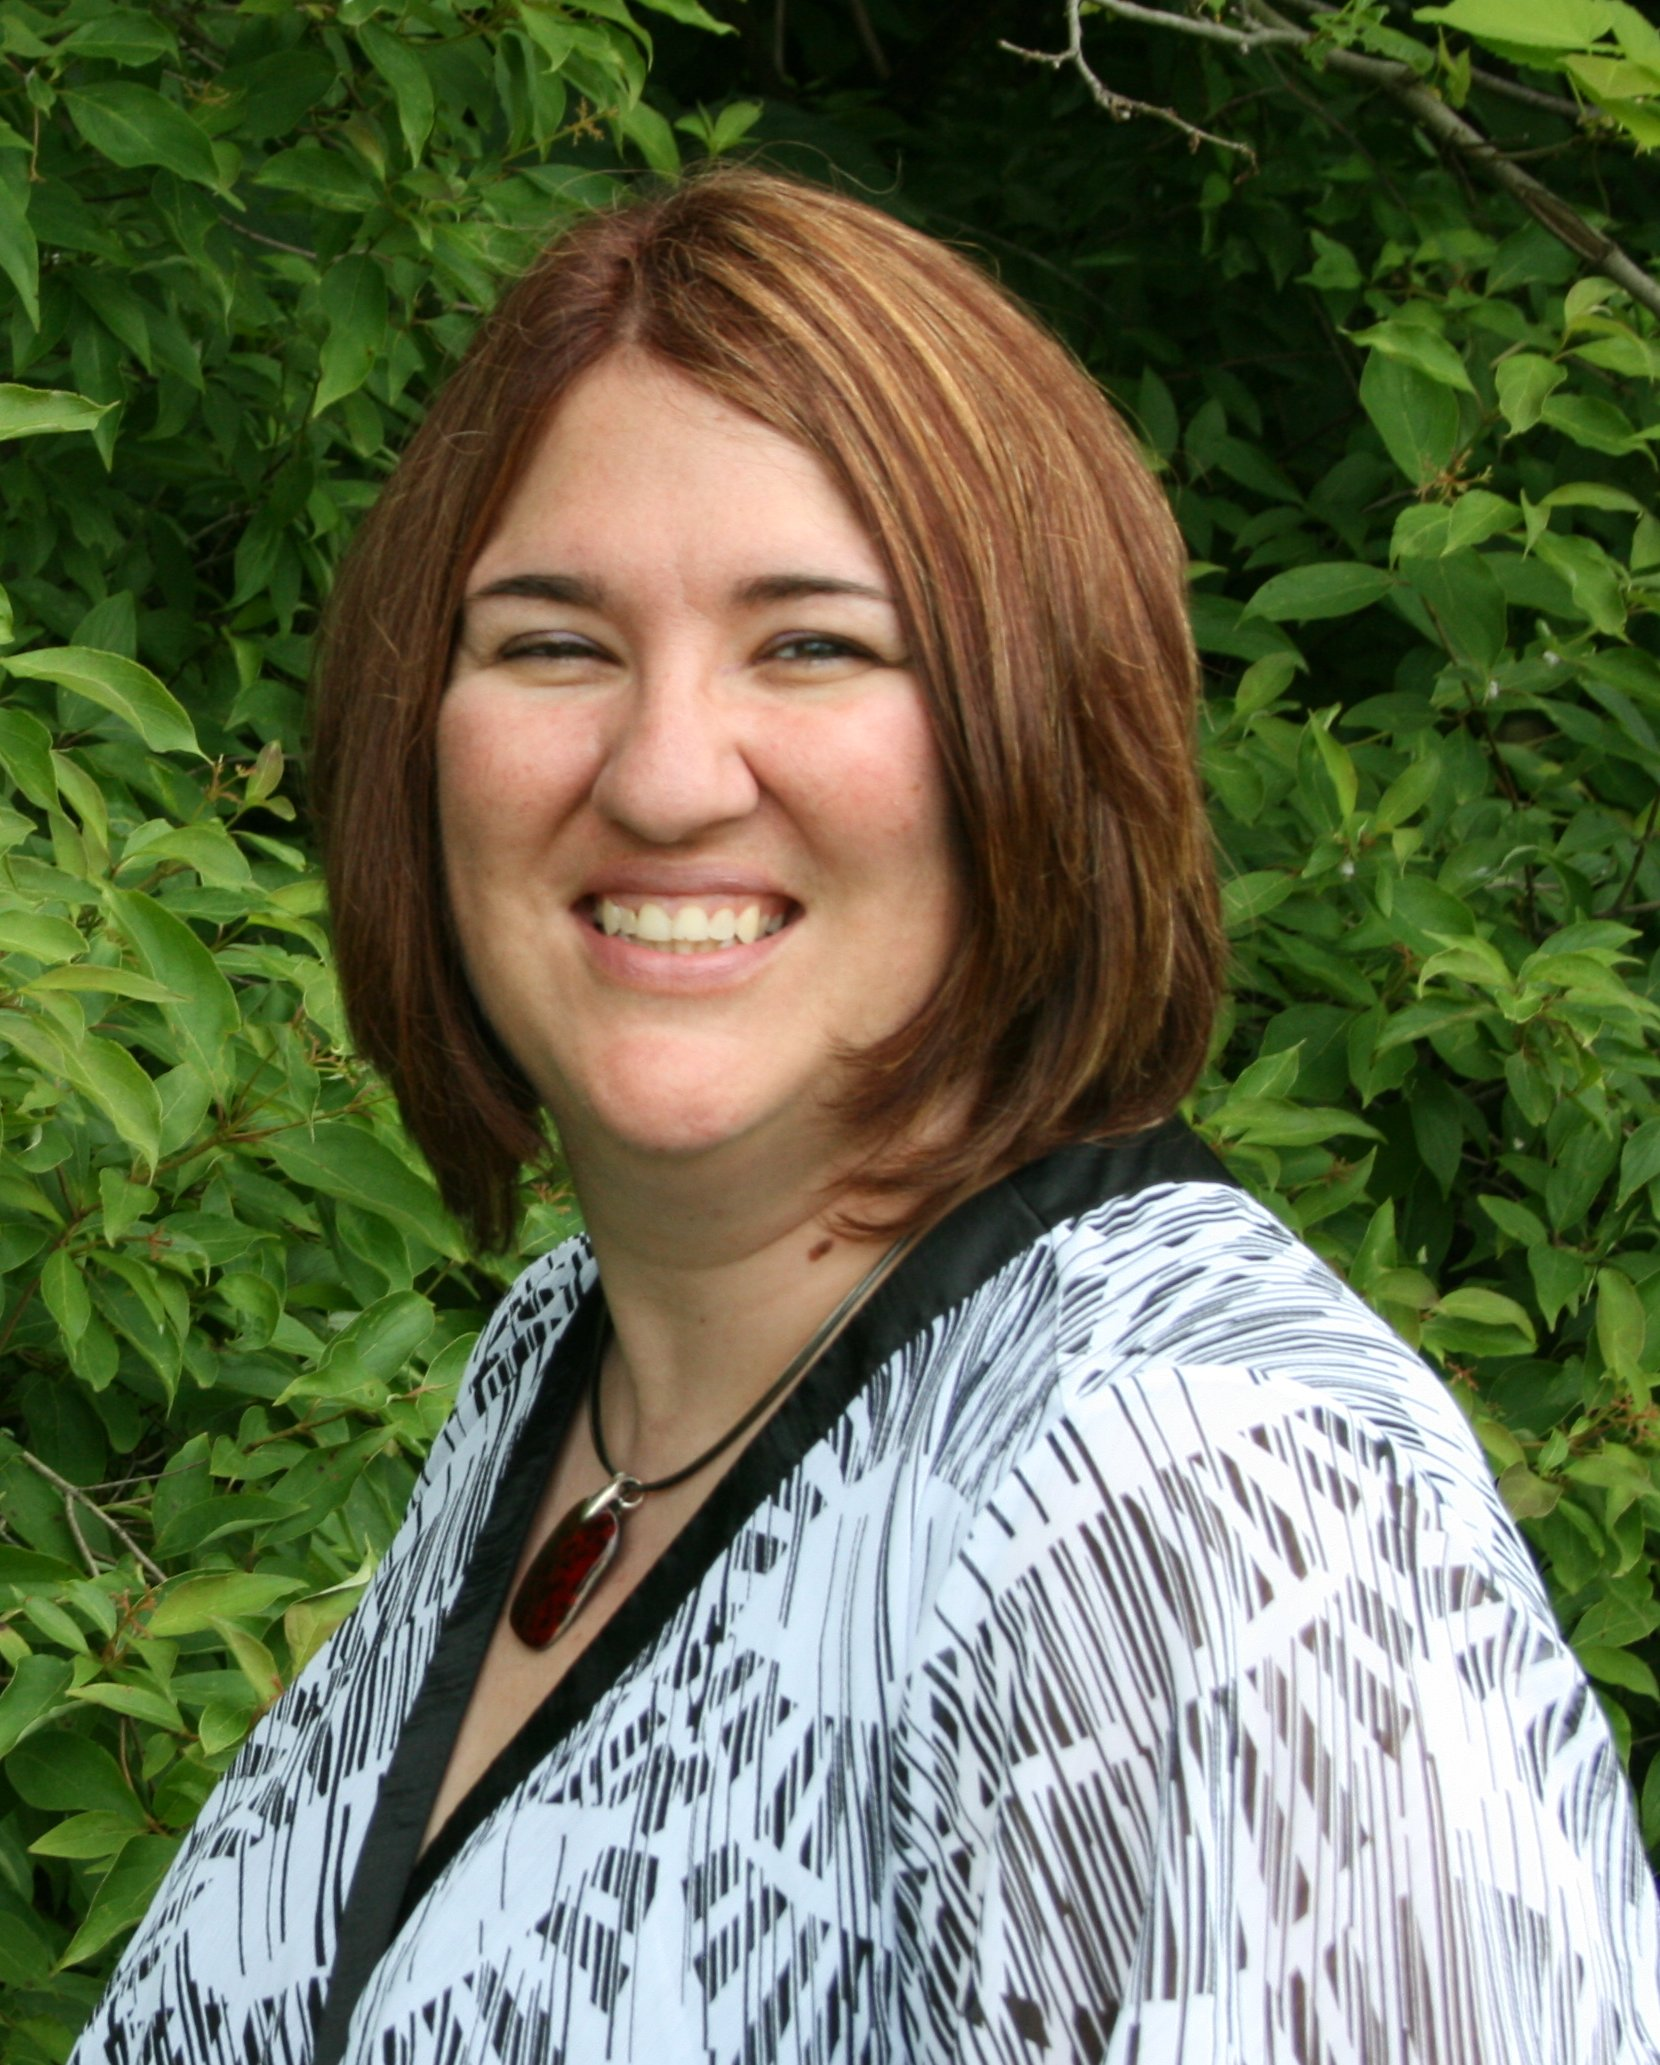 Ellen Belluomini, Our Featured Health Care Trailblazer